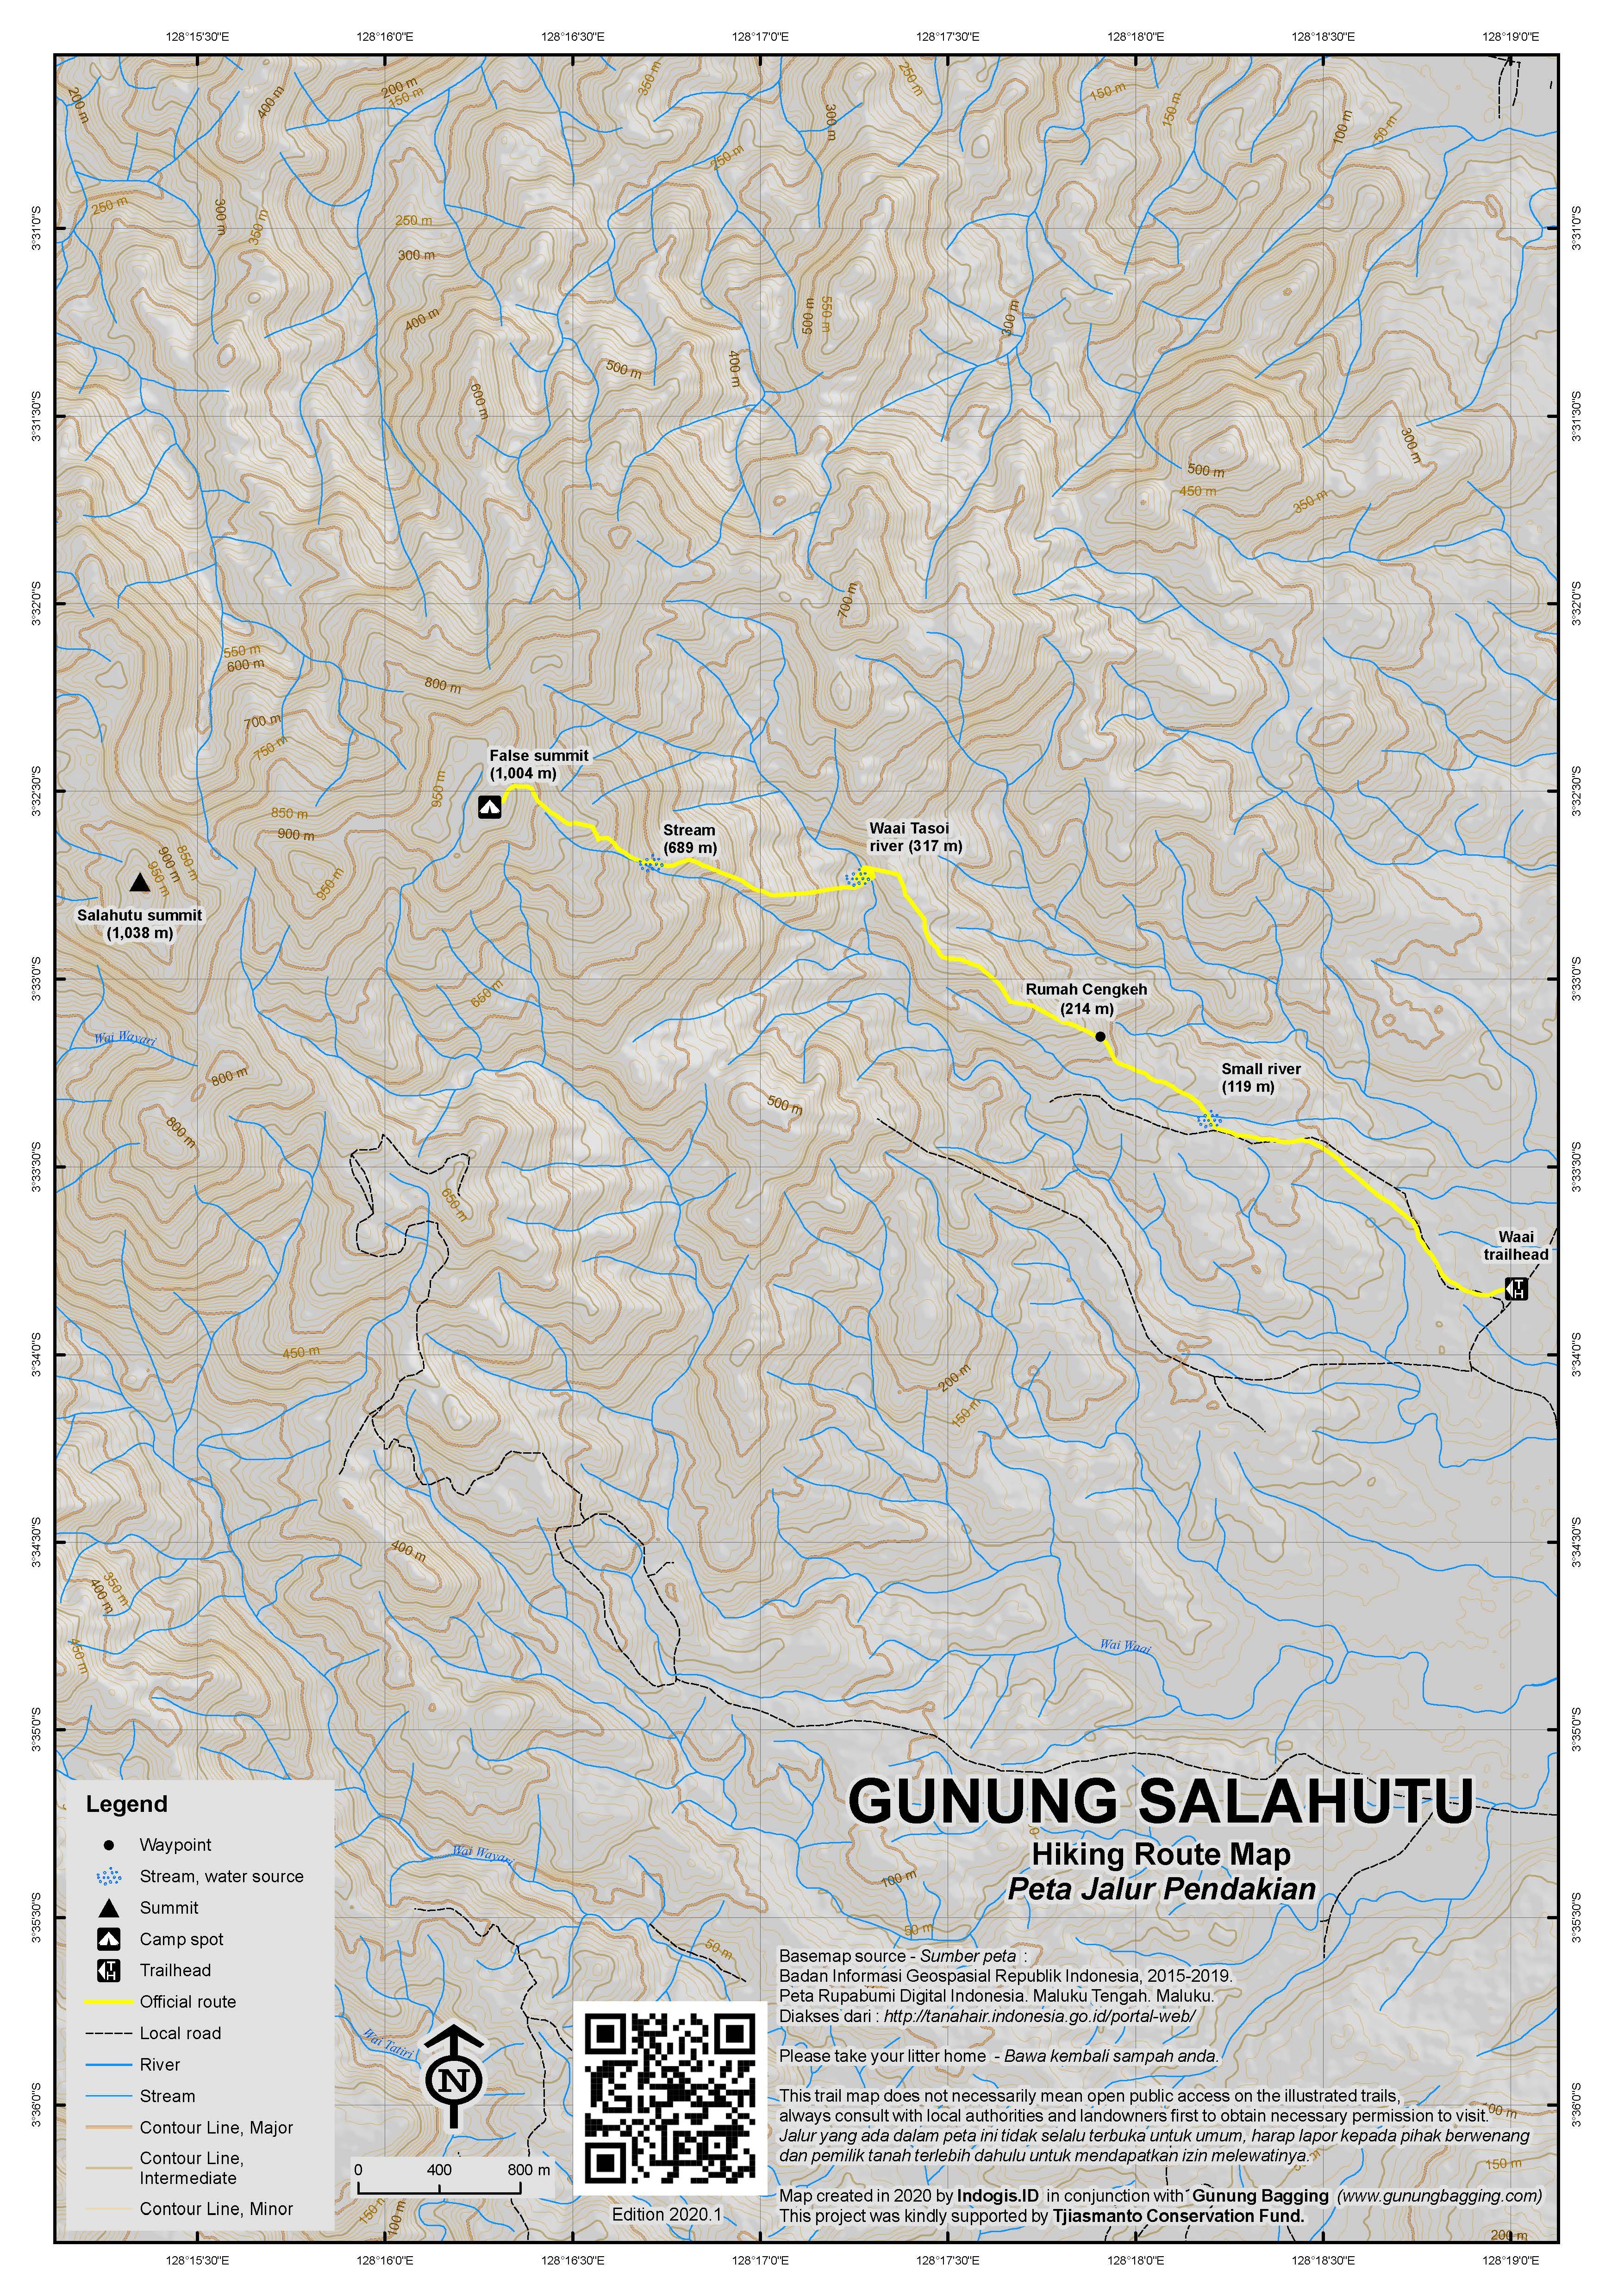 Peta Jalur Pendakian Gunung Salahutu